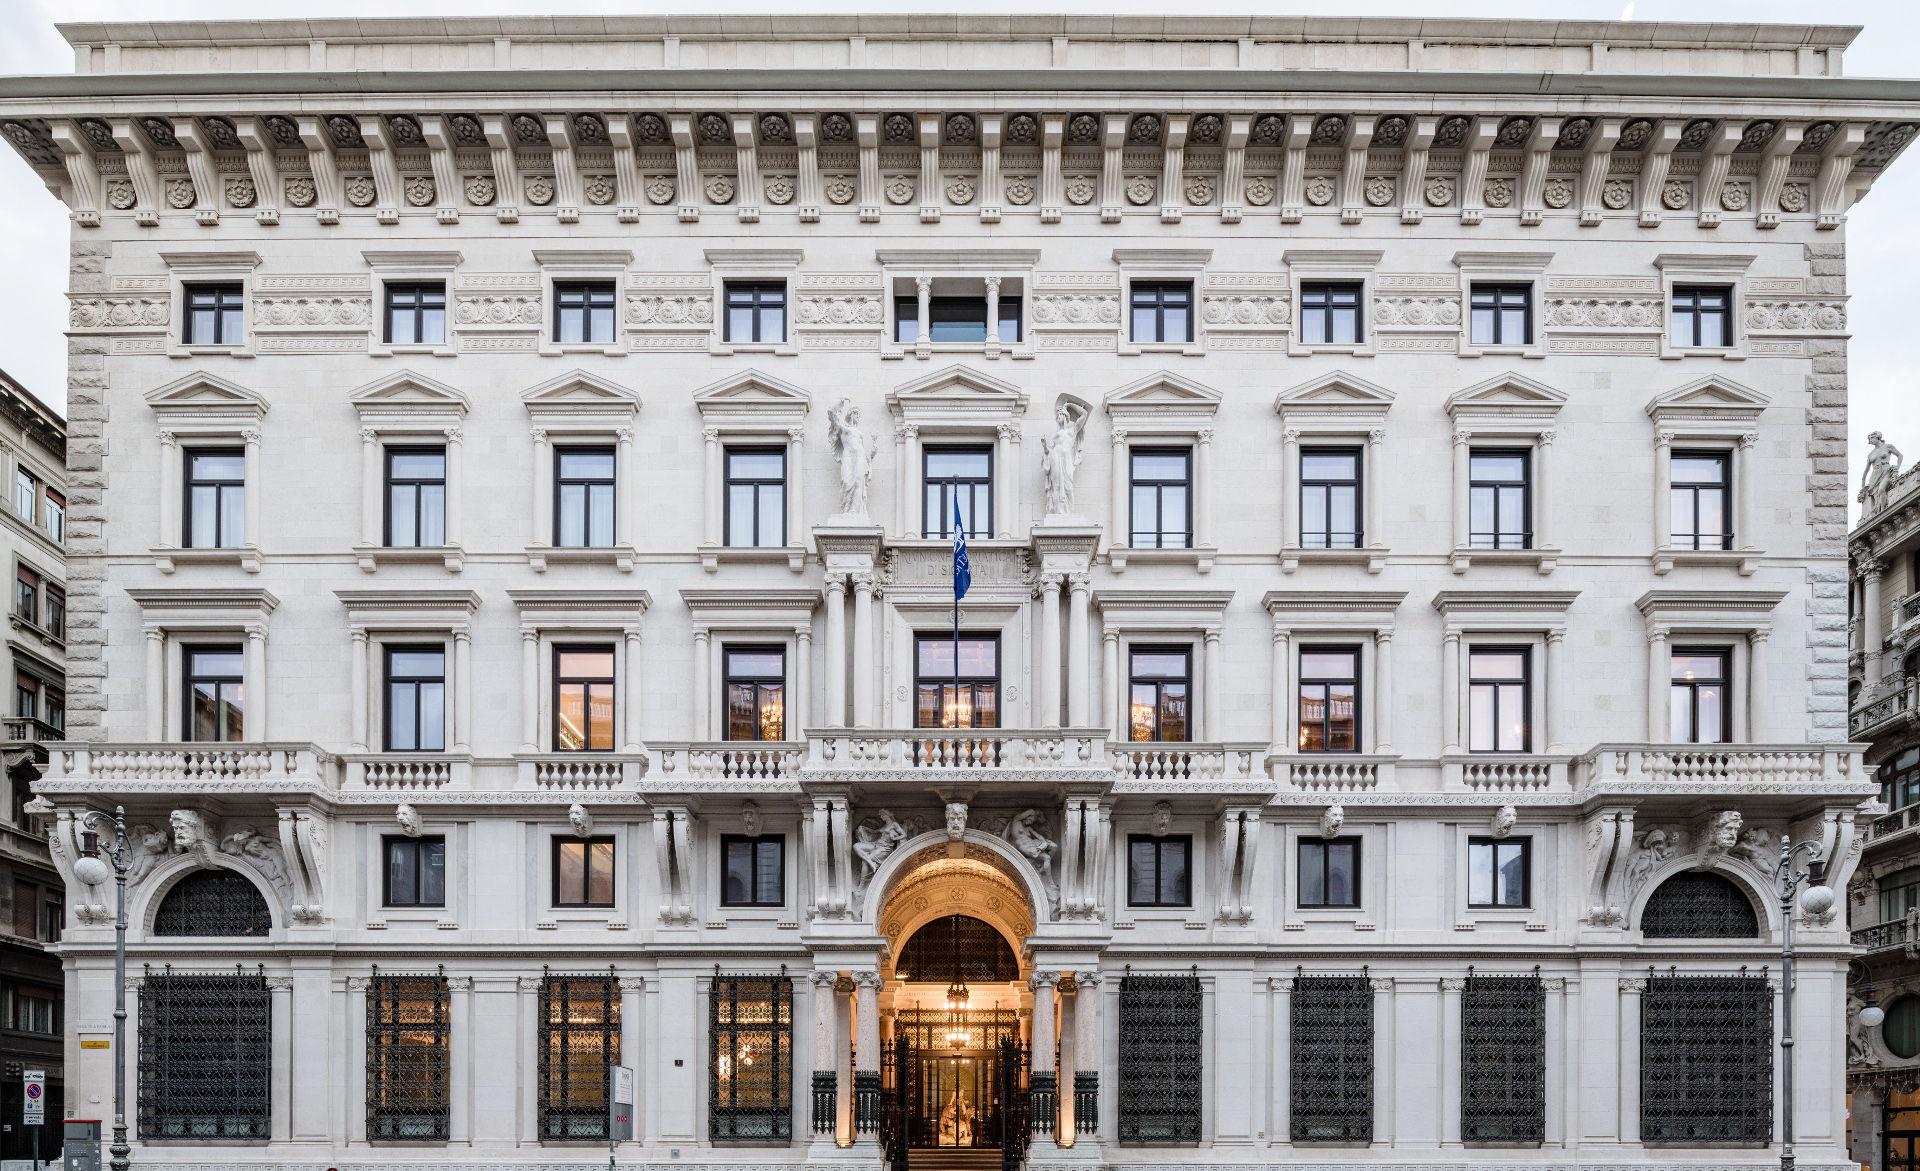 Palazzo ex Ras - Nuovo Hotel Hilton - image 3